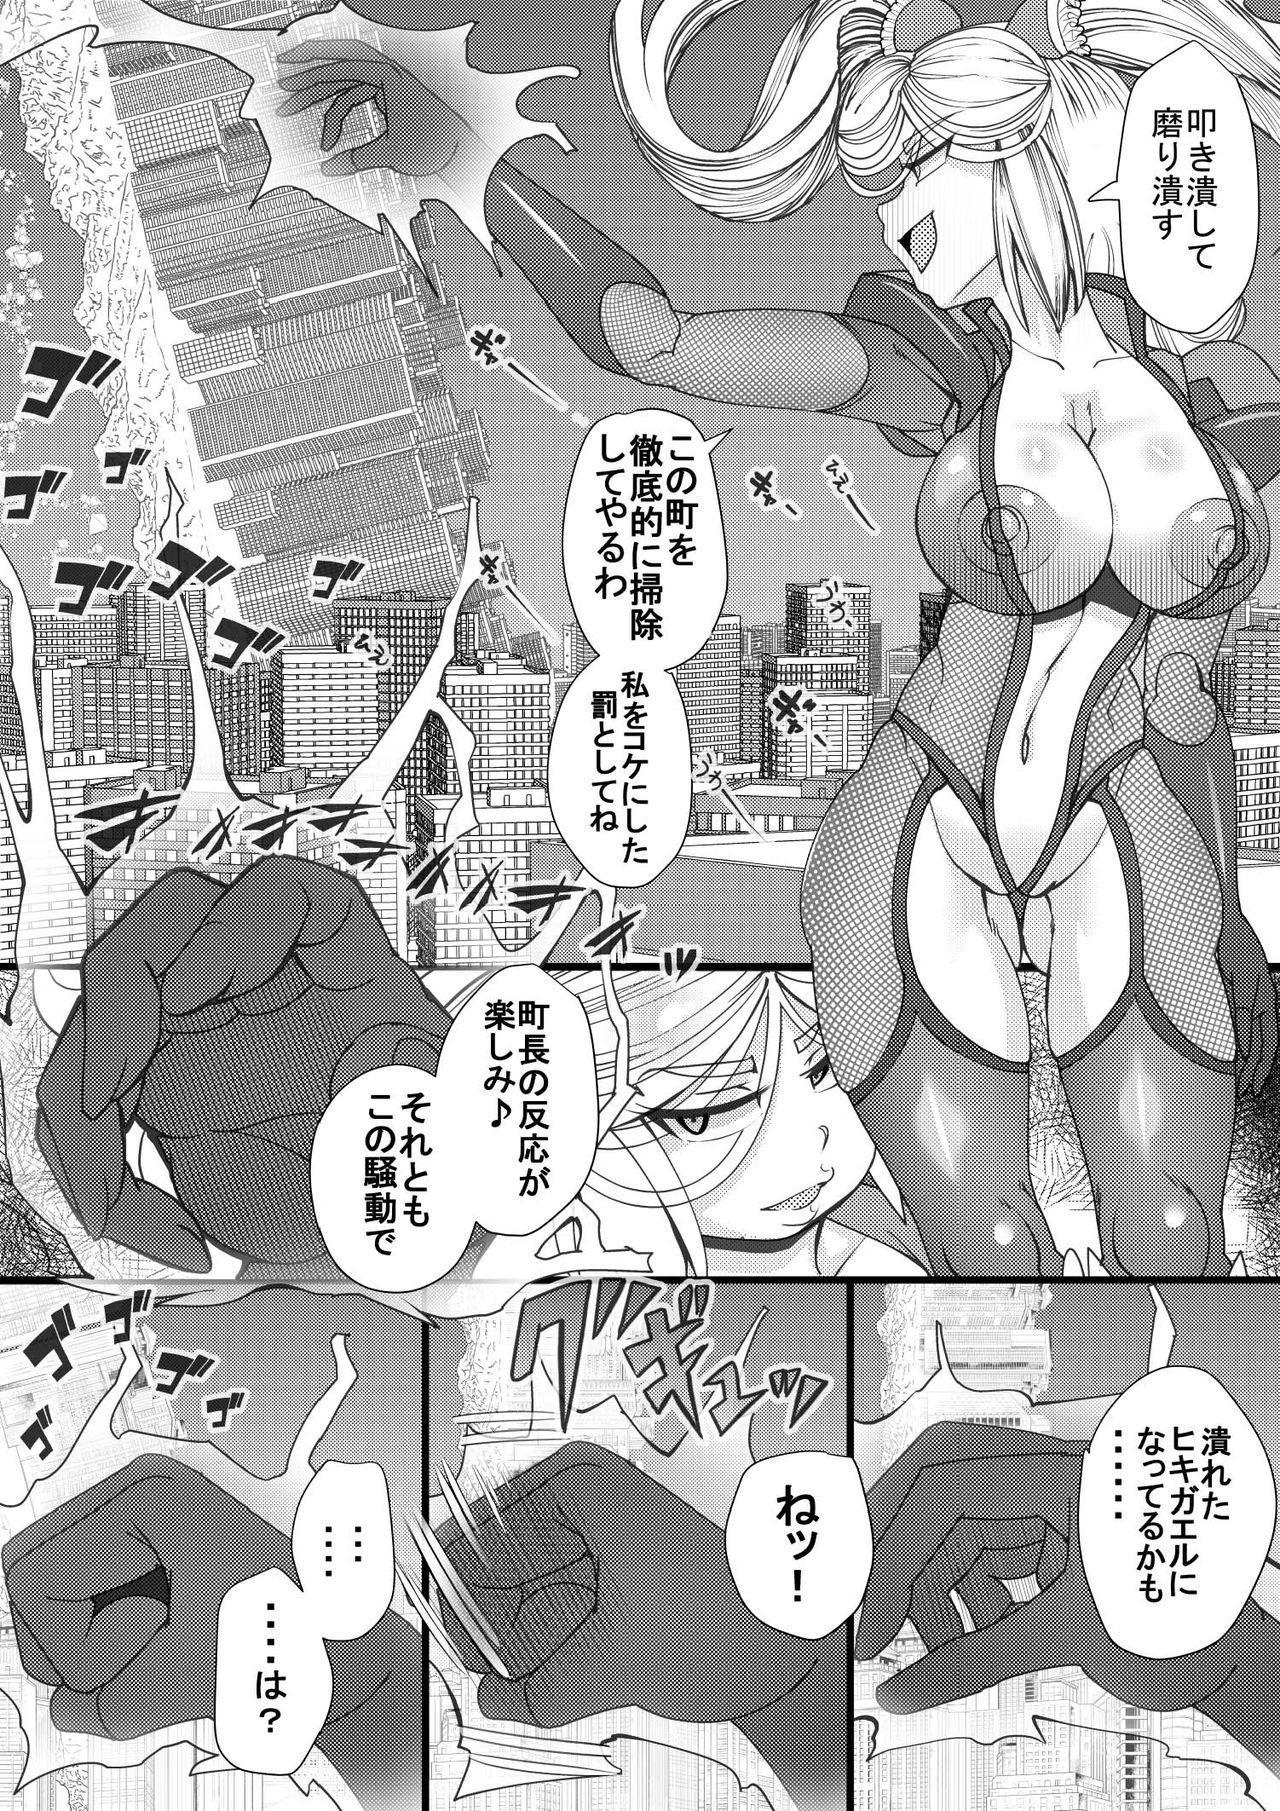 Haramachi 9 3